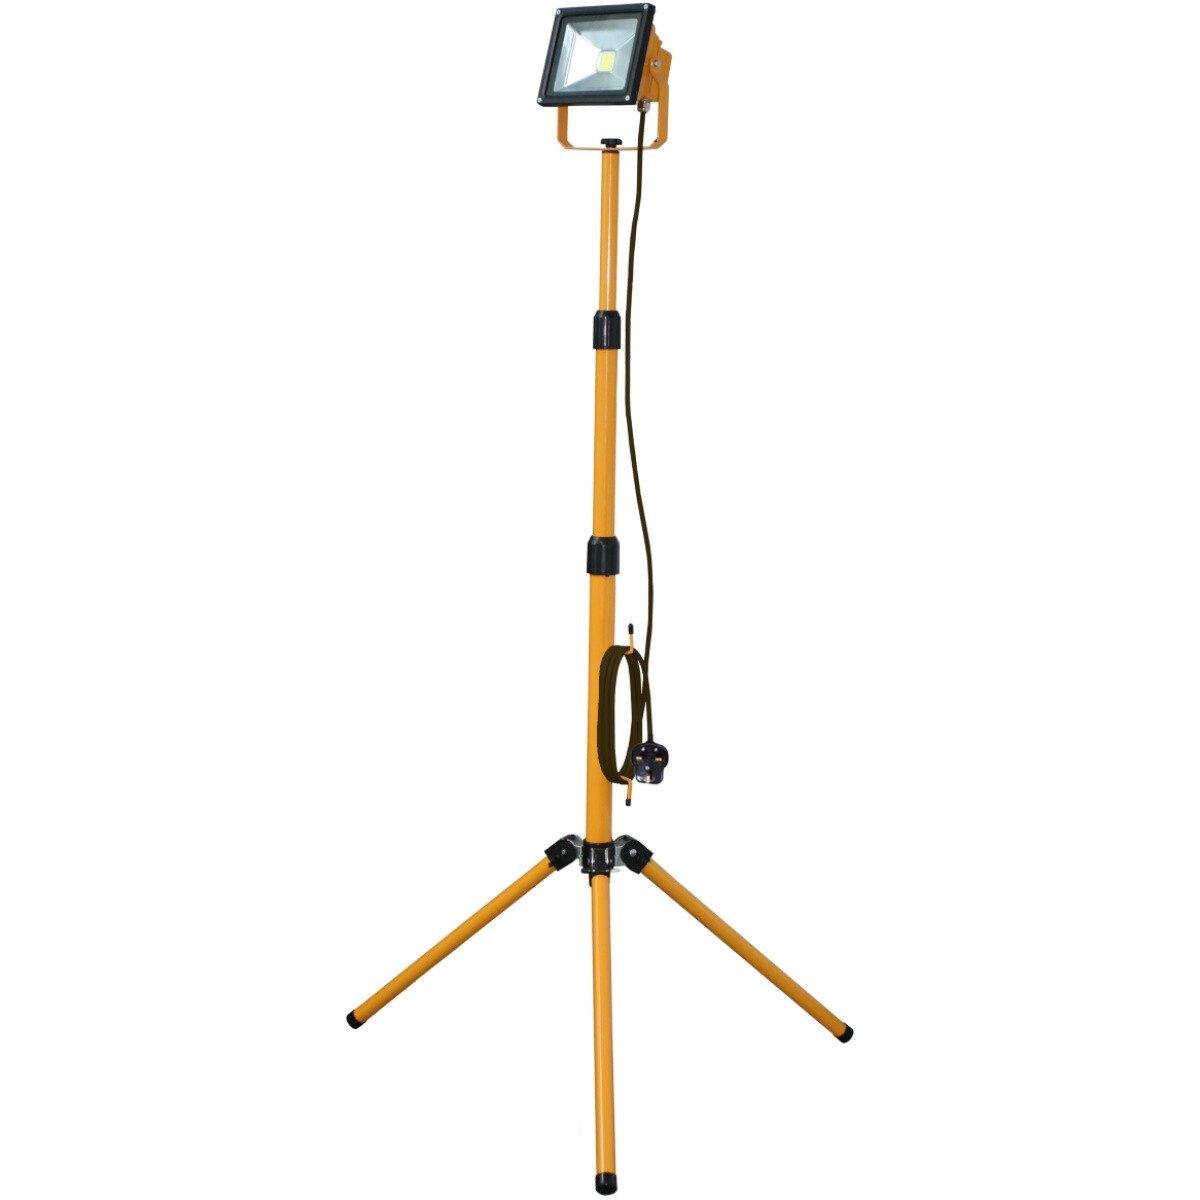 Spectre SP-17191 230V STD 20W COB LED Floodlight Work Light